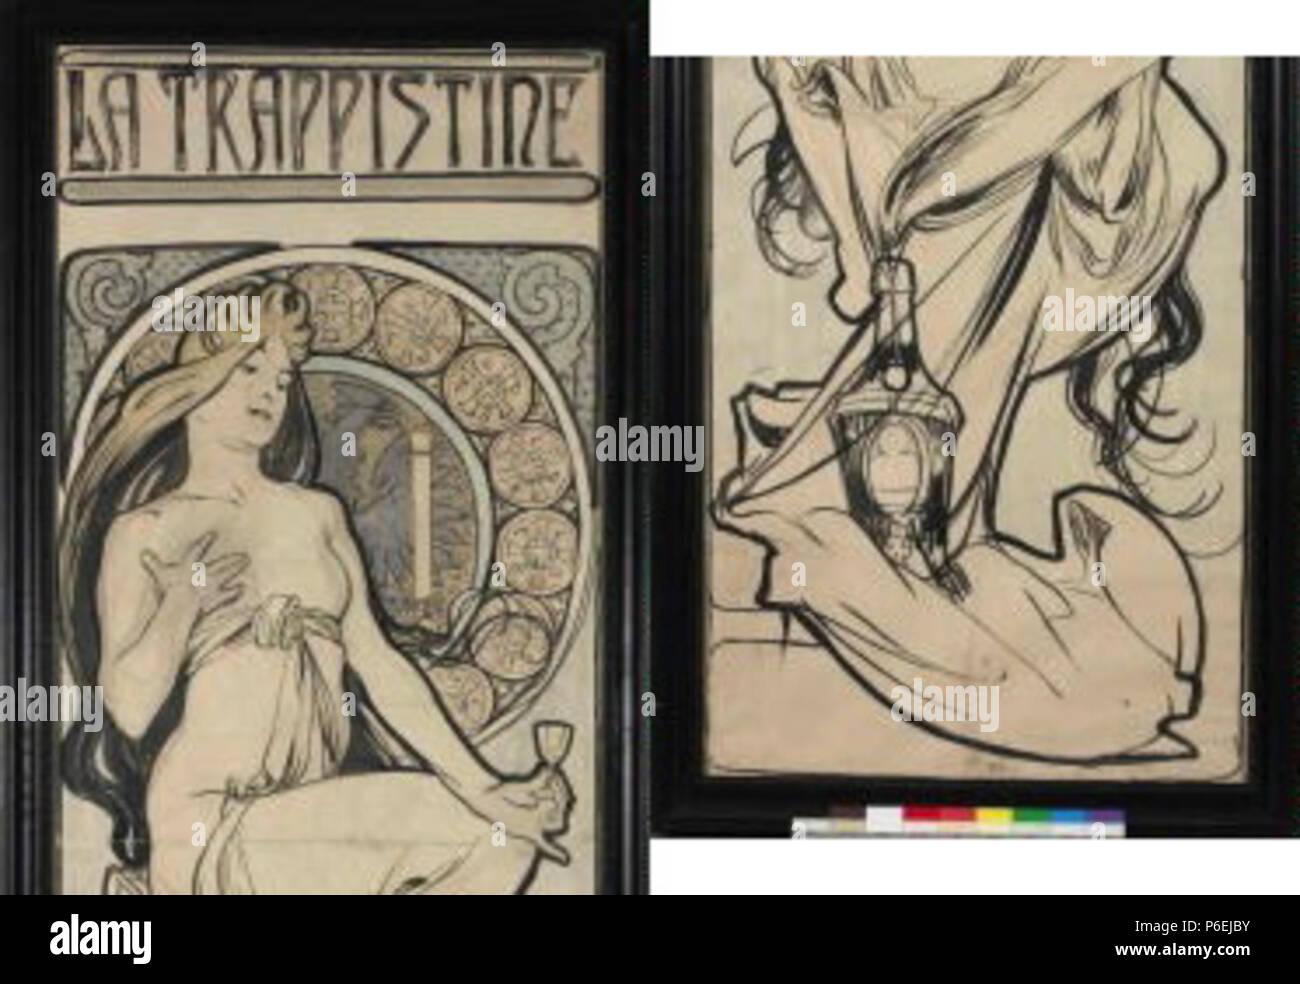 .: La Trappistine eština - návrh na plakát circa 1897 6 Autor Alfons Mucha 24.7.1860-14.7.1939 - La Trappistine navrh plakat - NA Foto de stock